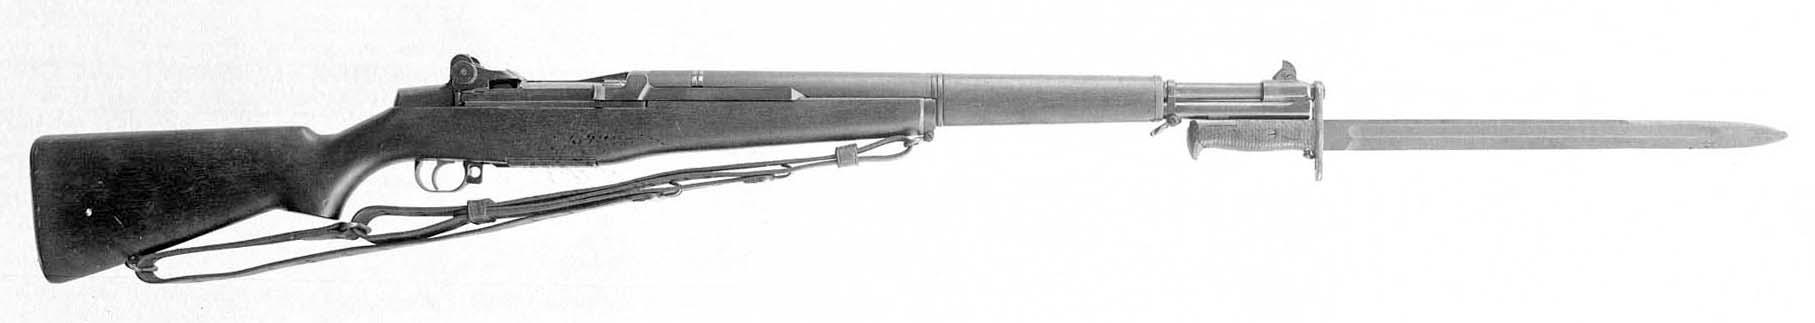 Experimental Semi Automatic Rifles By John Garand 1919 1936